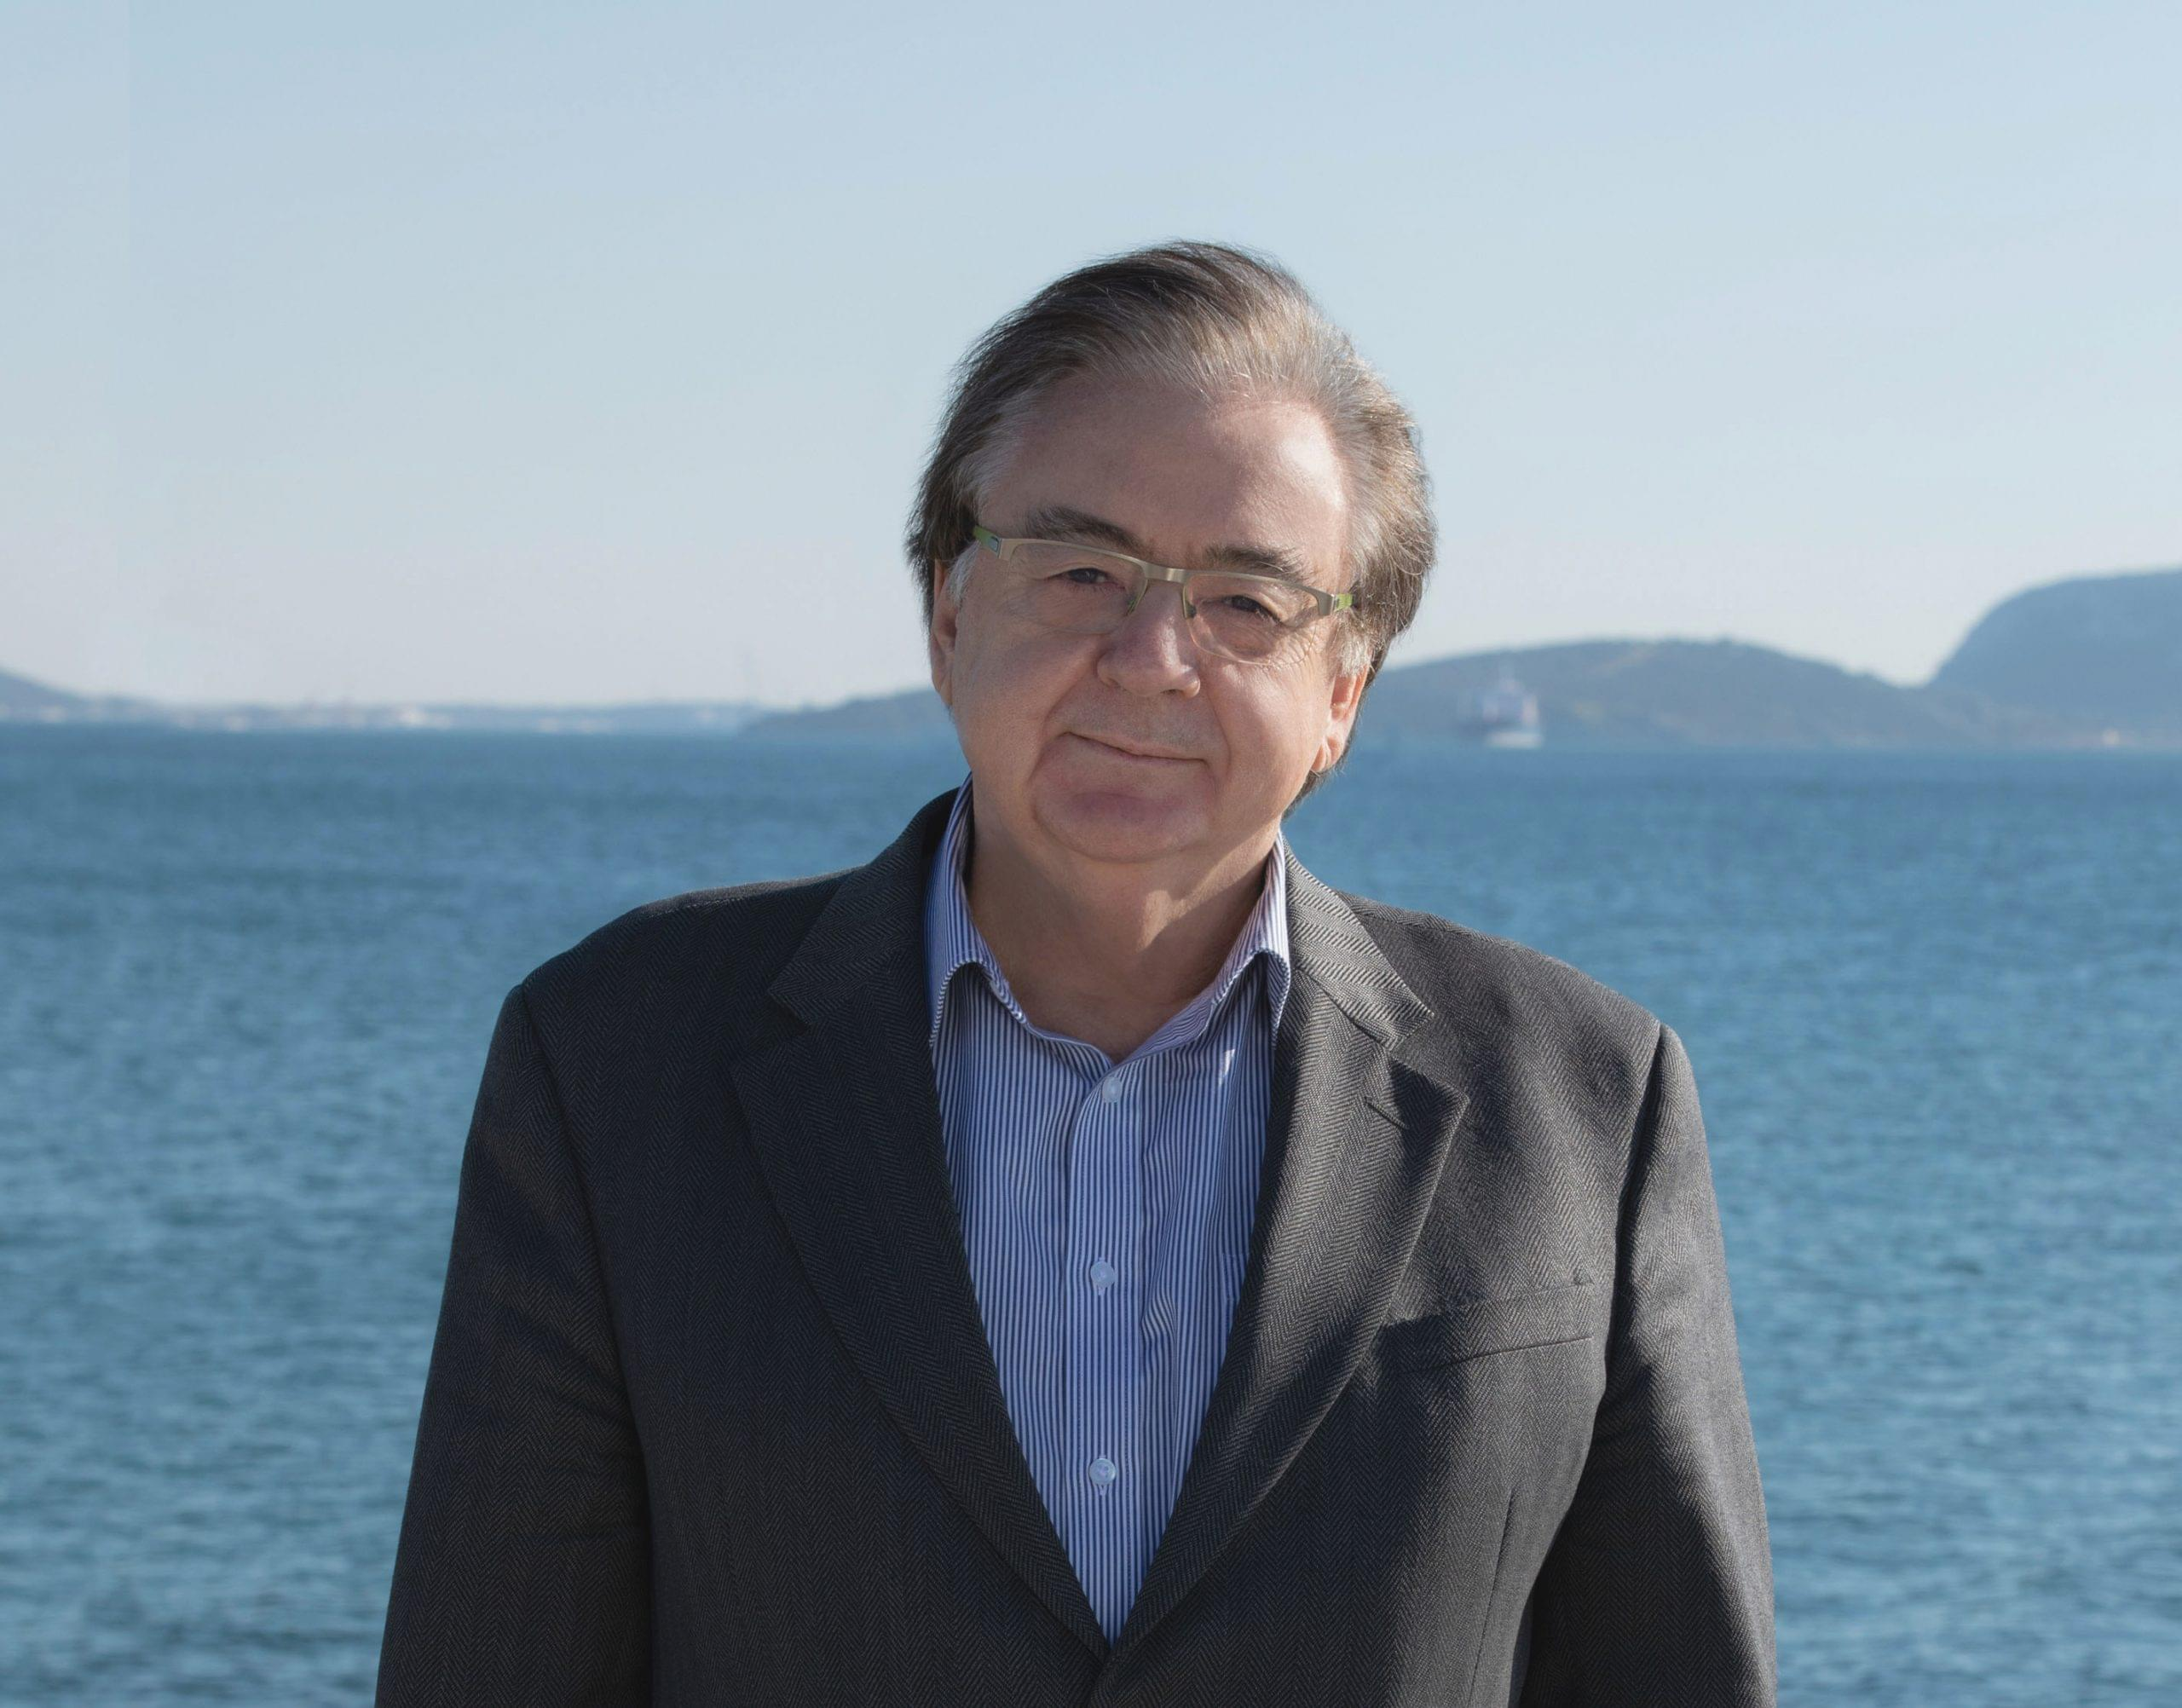 You are currently viewing Απόστολος Καμαρινάκης: Ο Λιμένας Ελευσίνας, σημείο αναφοράς για εμπορευματικές ροές και Θριάσιο